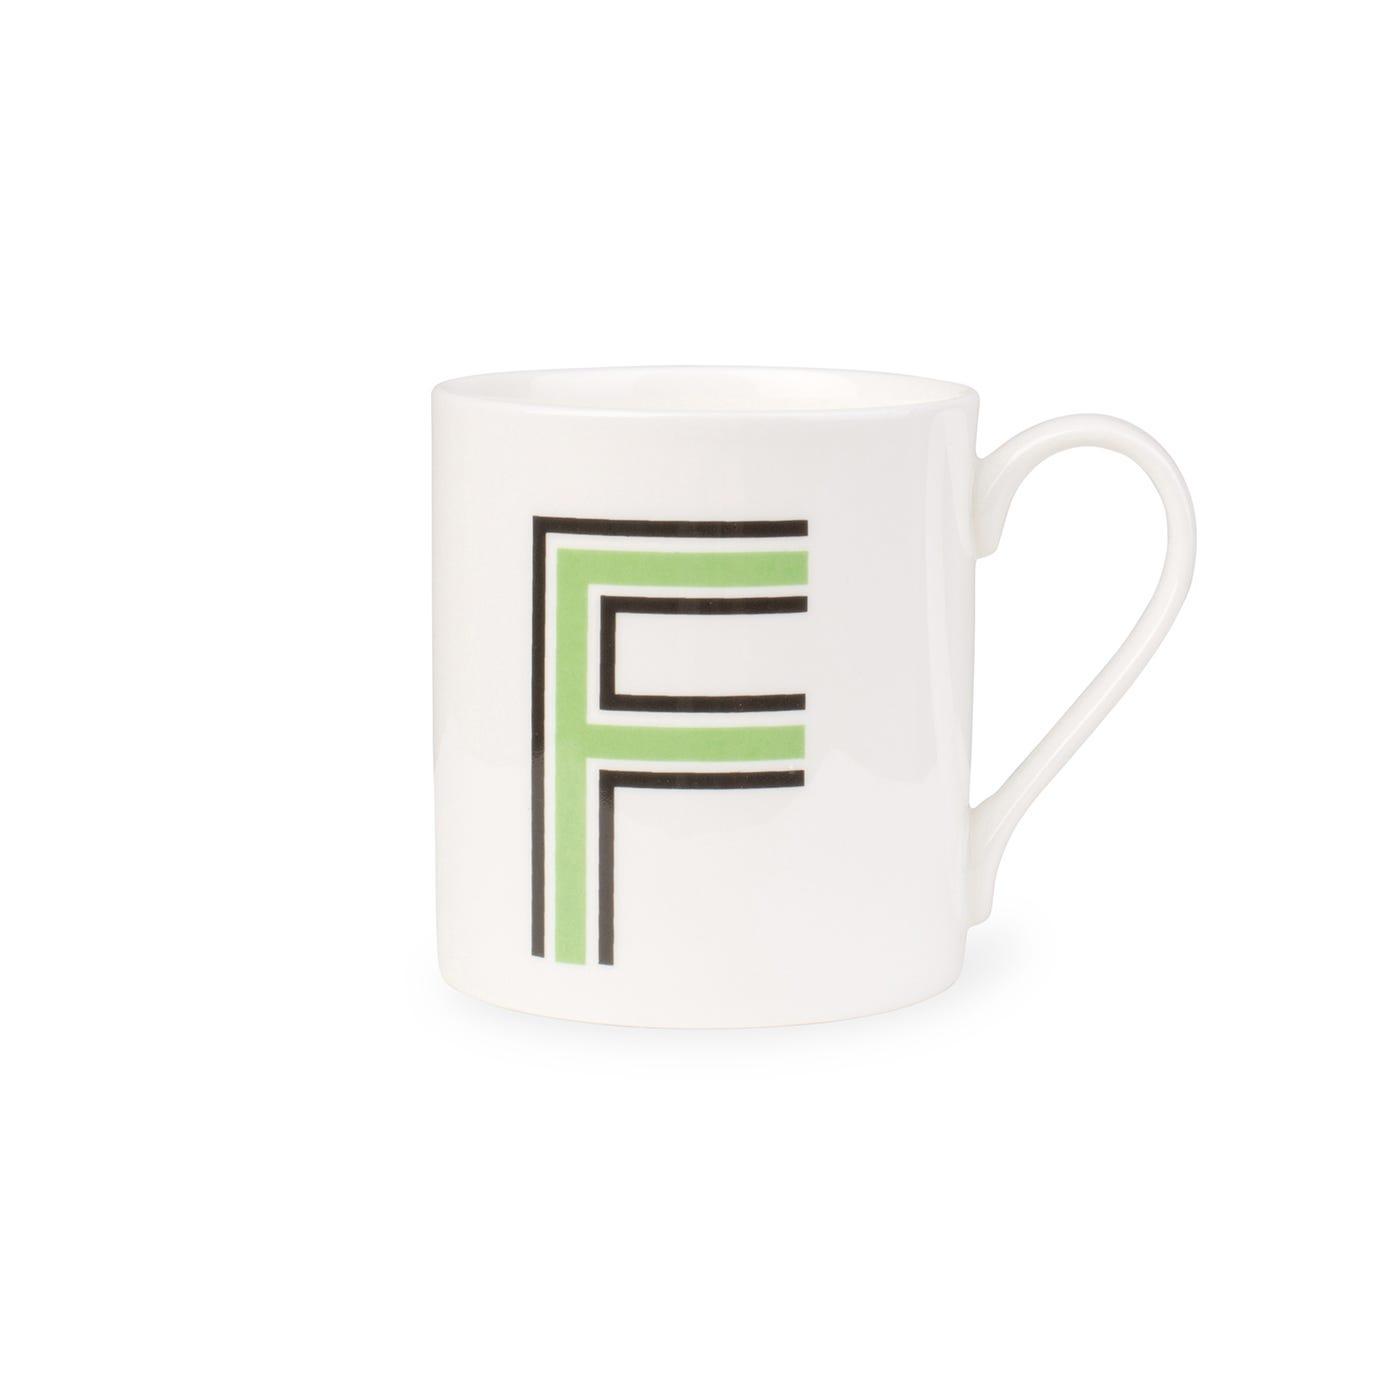 Heal's Heal's Heritage Alphabet Mug F